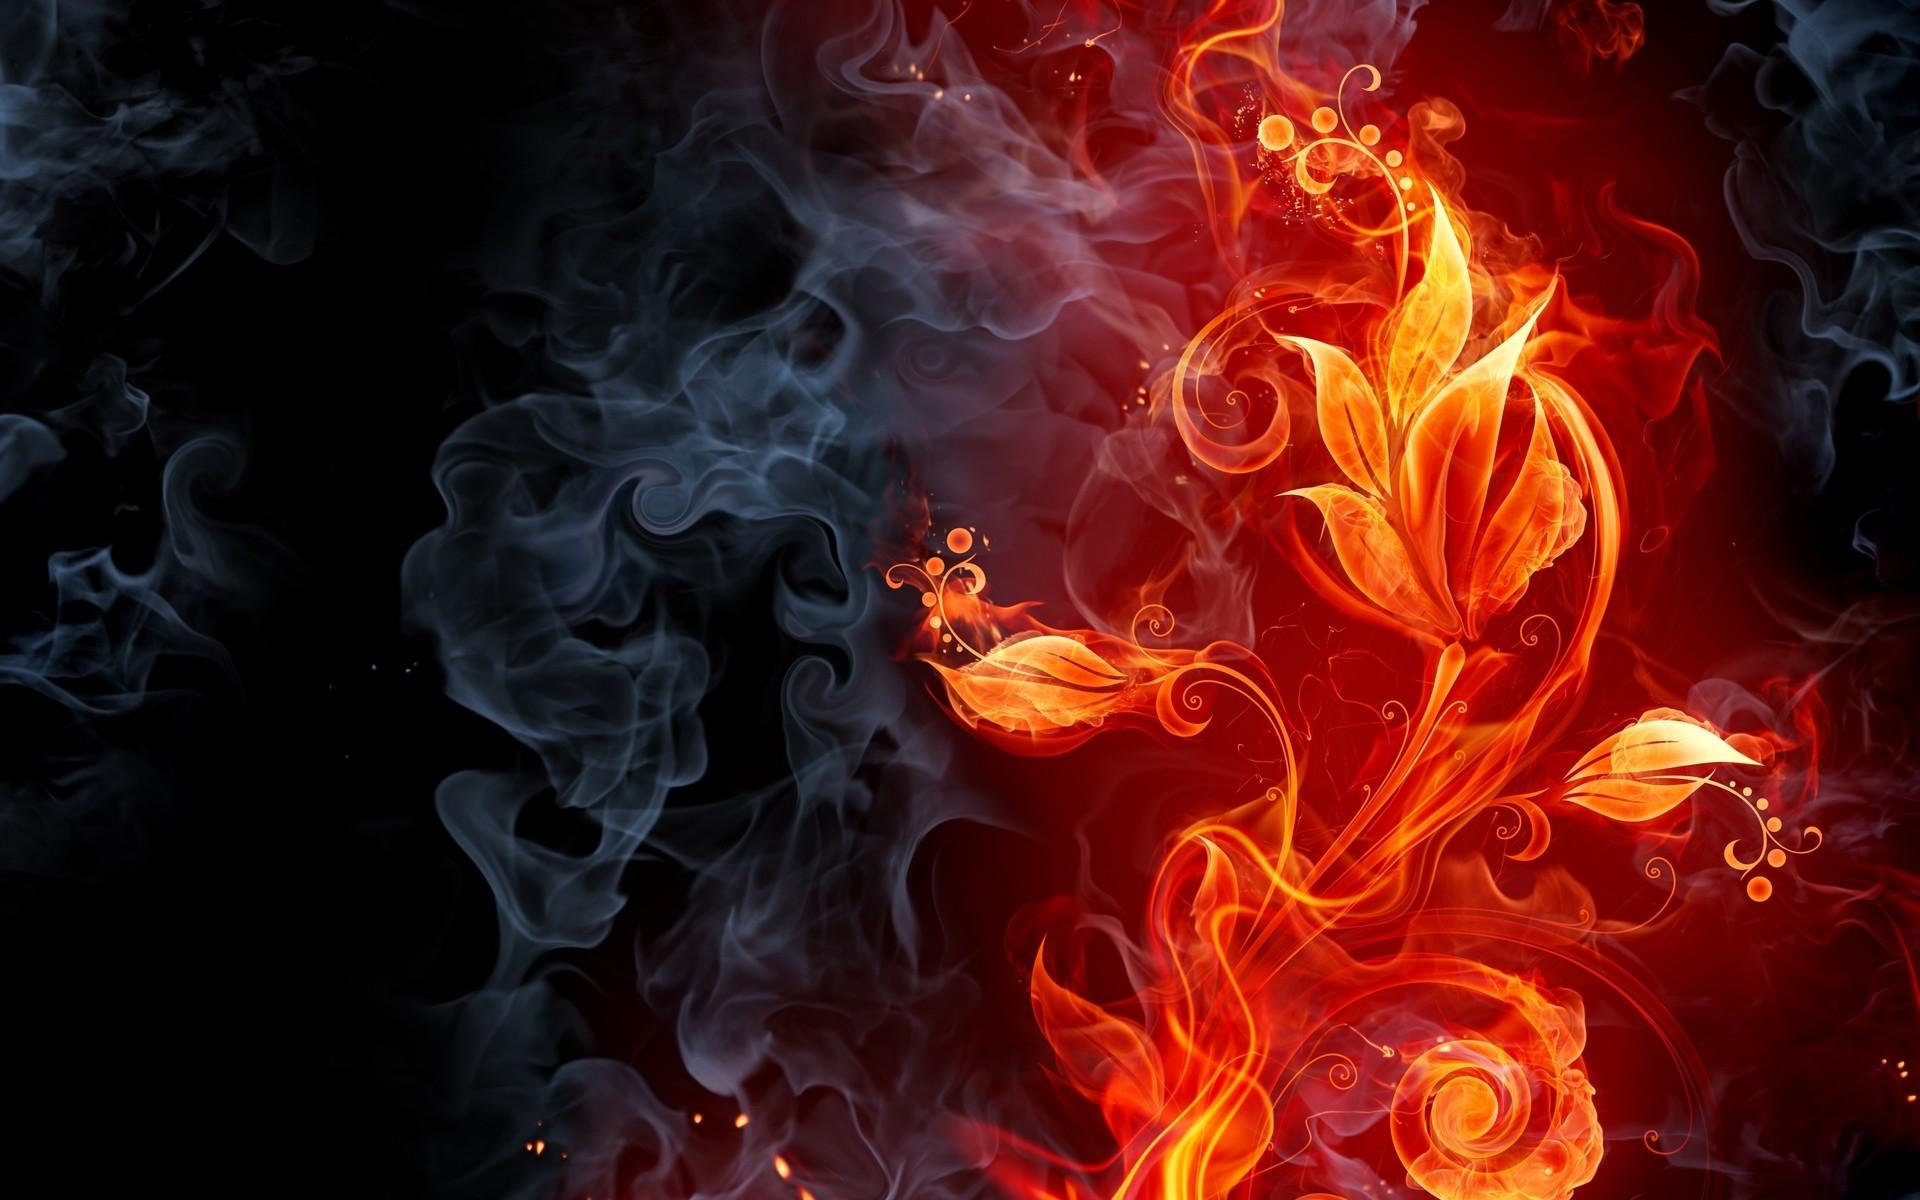 abstract fire flames smoke flowers cg digital art color wallpaper .